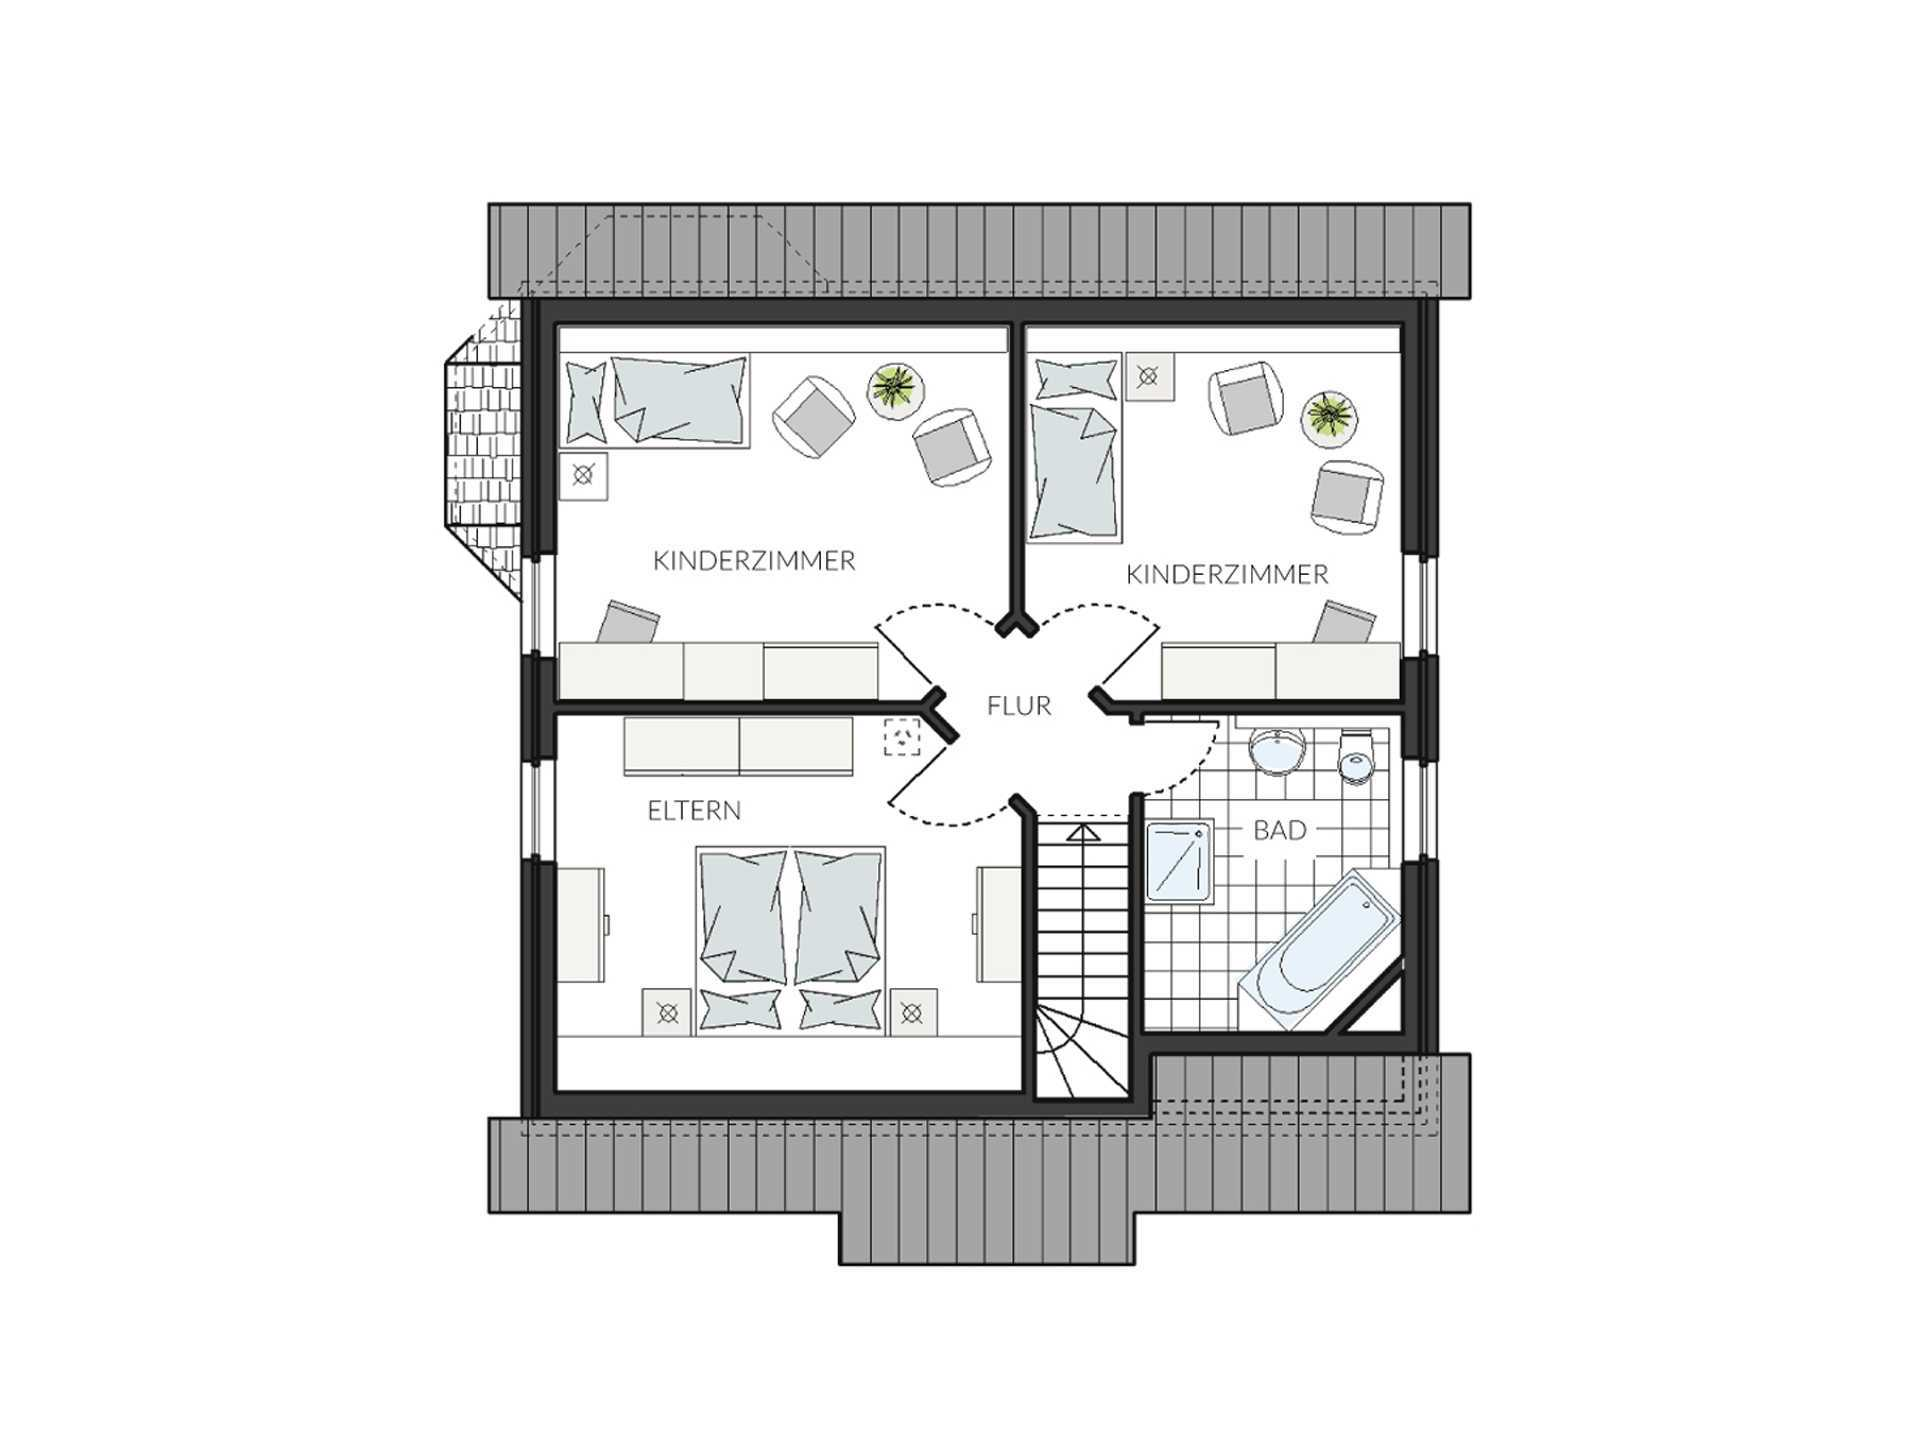 Einfamilienhaus ProFamily 146 Grundriss DG